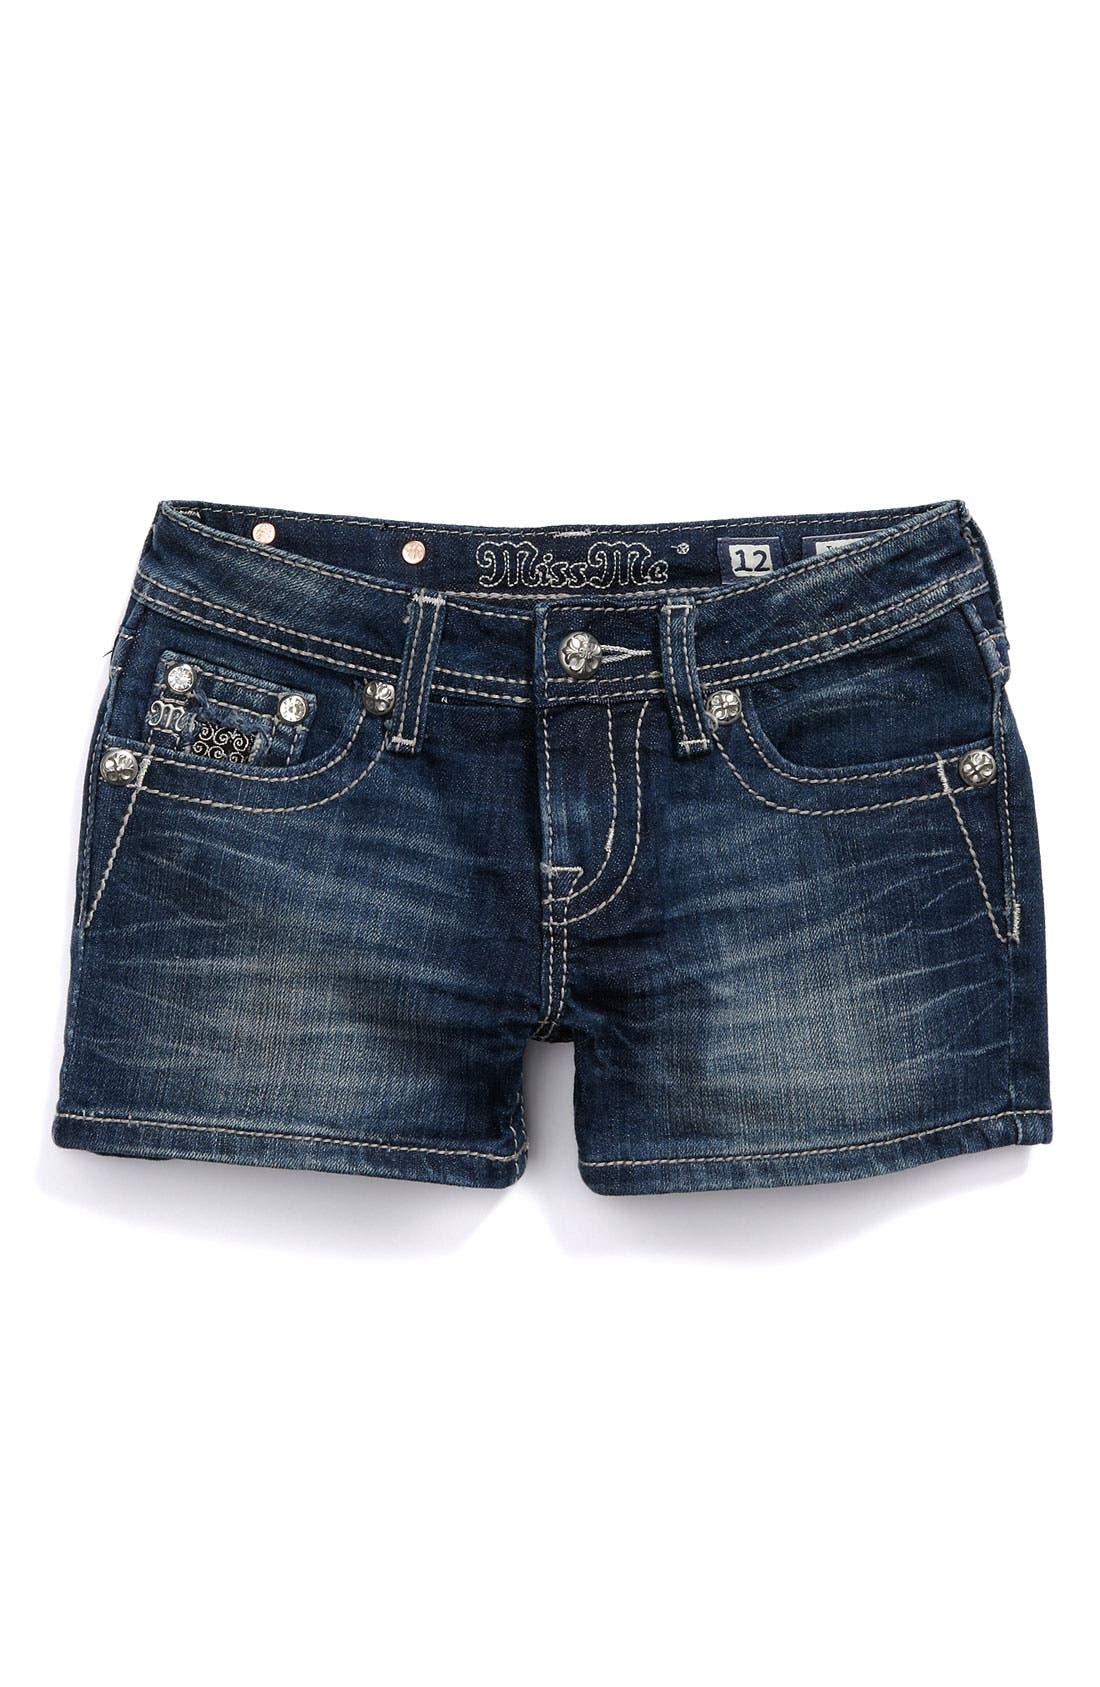 Alternate Image 2  - Miss Me Pointed Flap Pocket Shorts (Big Girls)